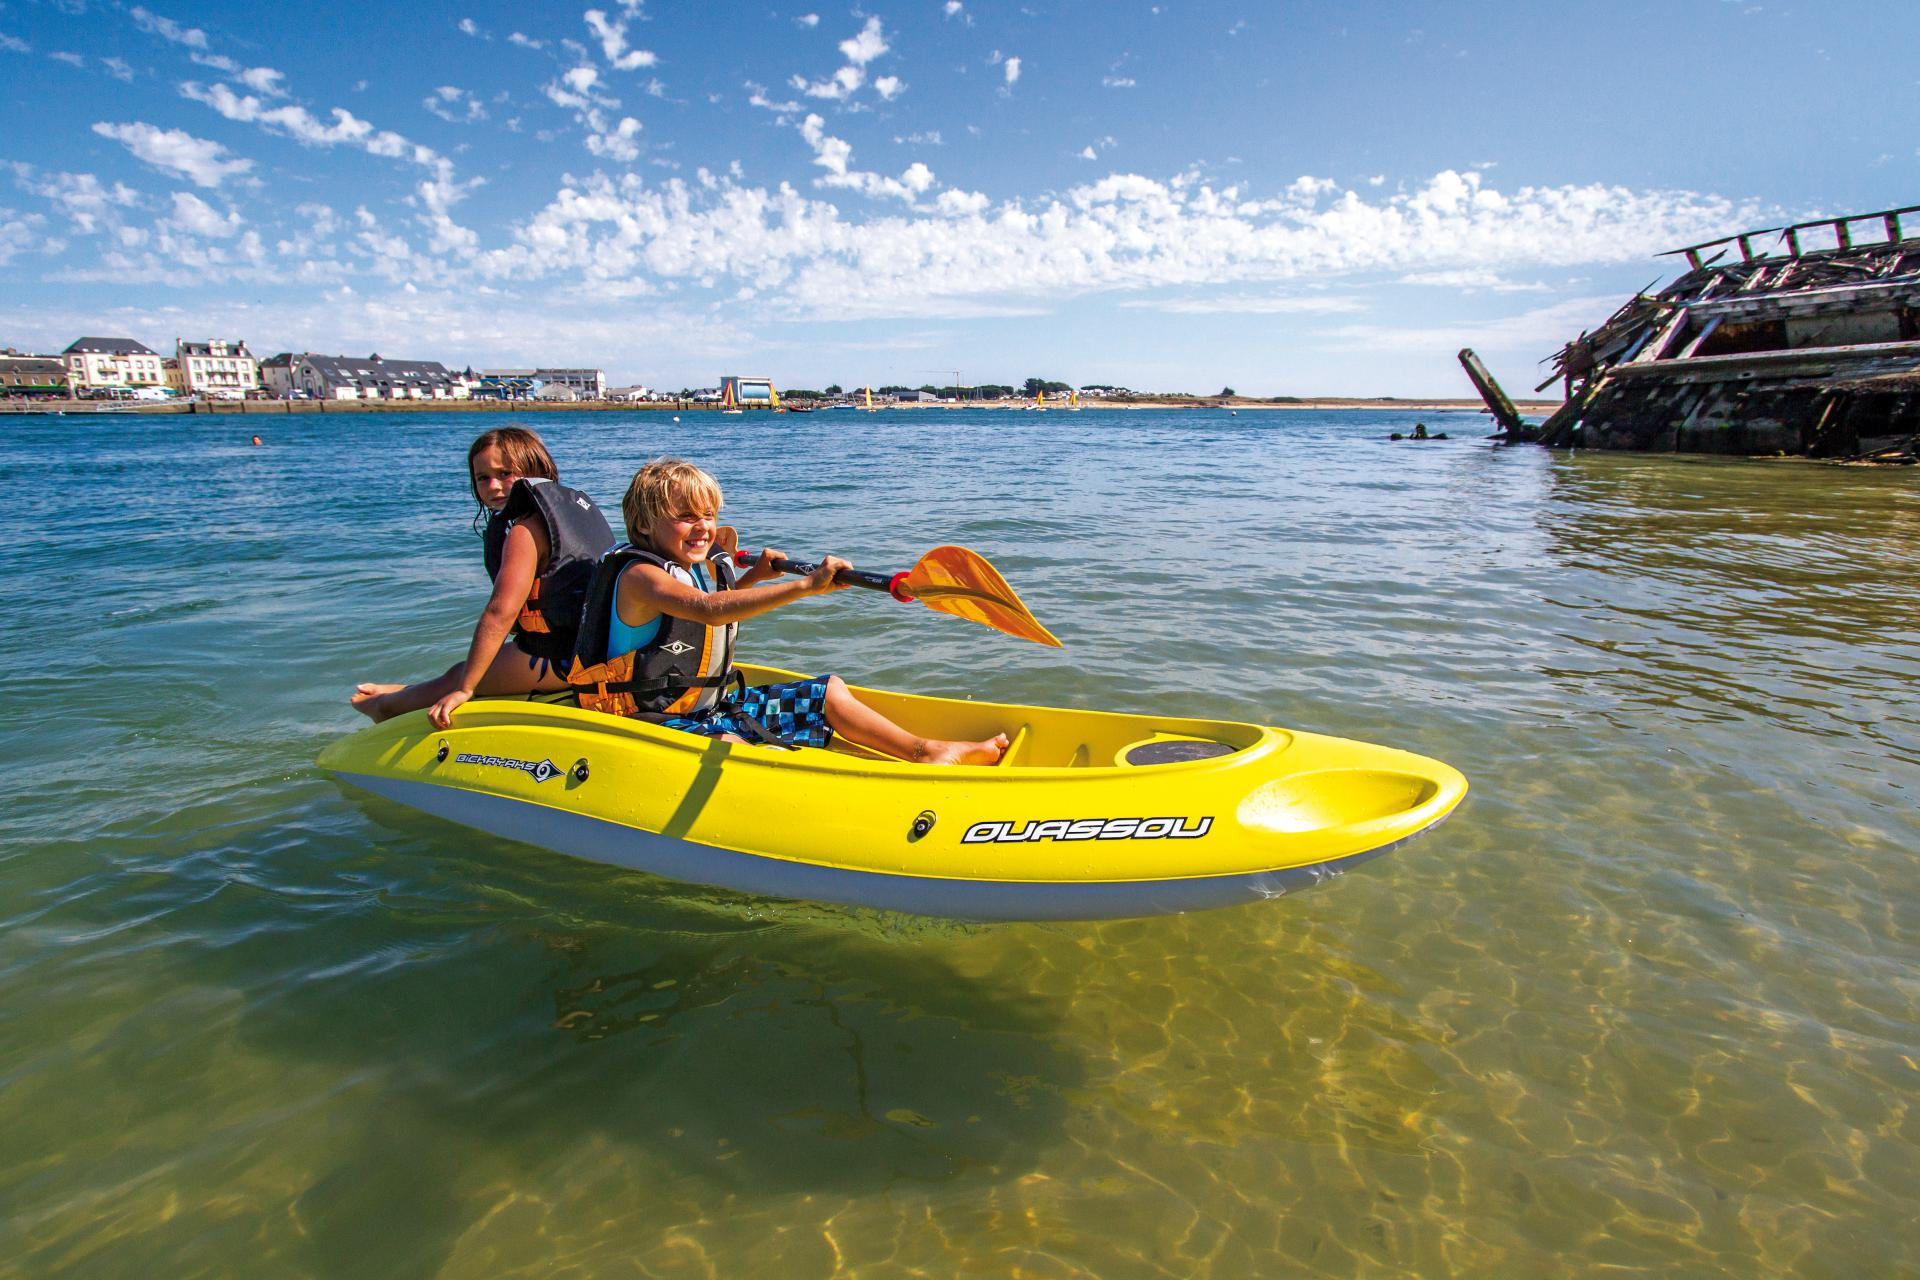 Idée cadeau : Kayak au Club Nautique du Rohu (Morbihan, Bretagne)